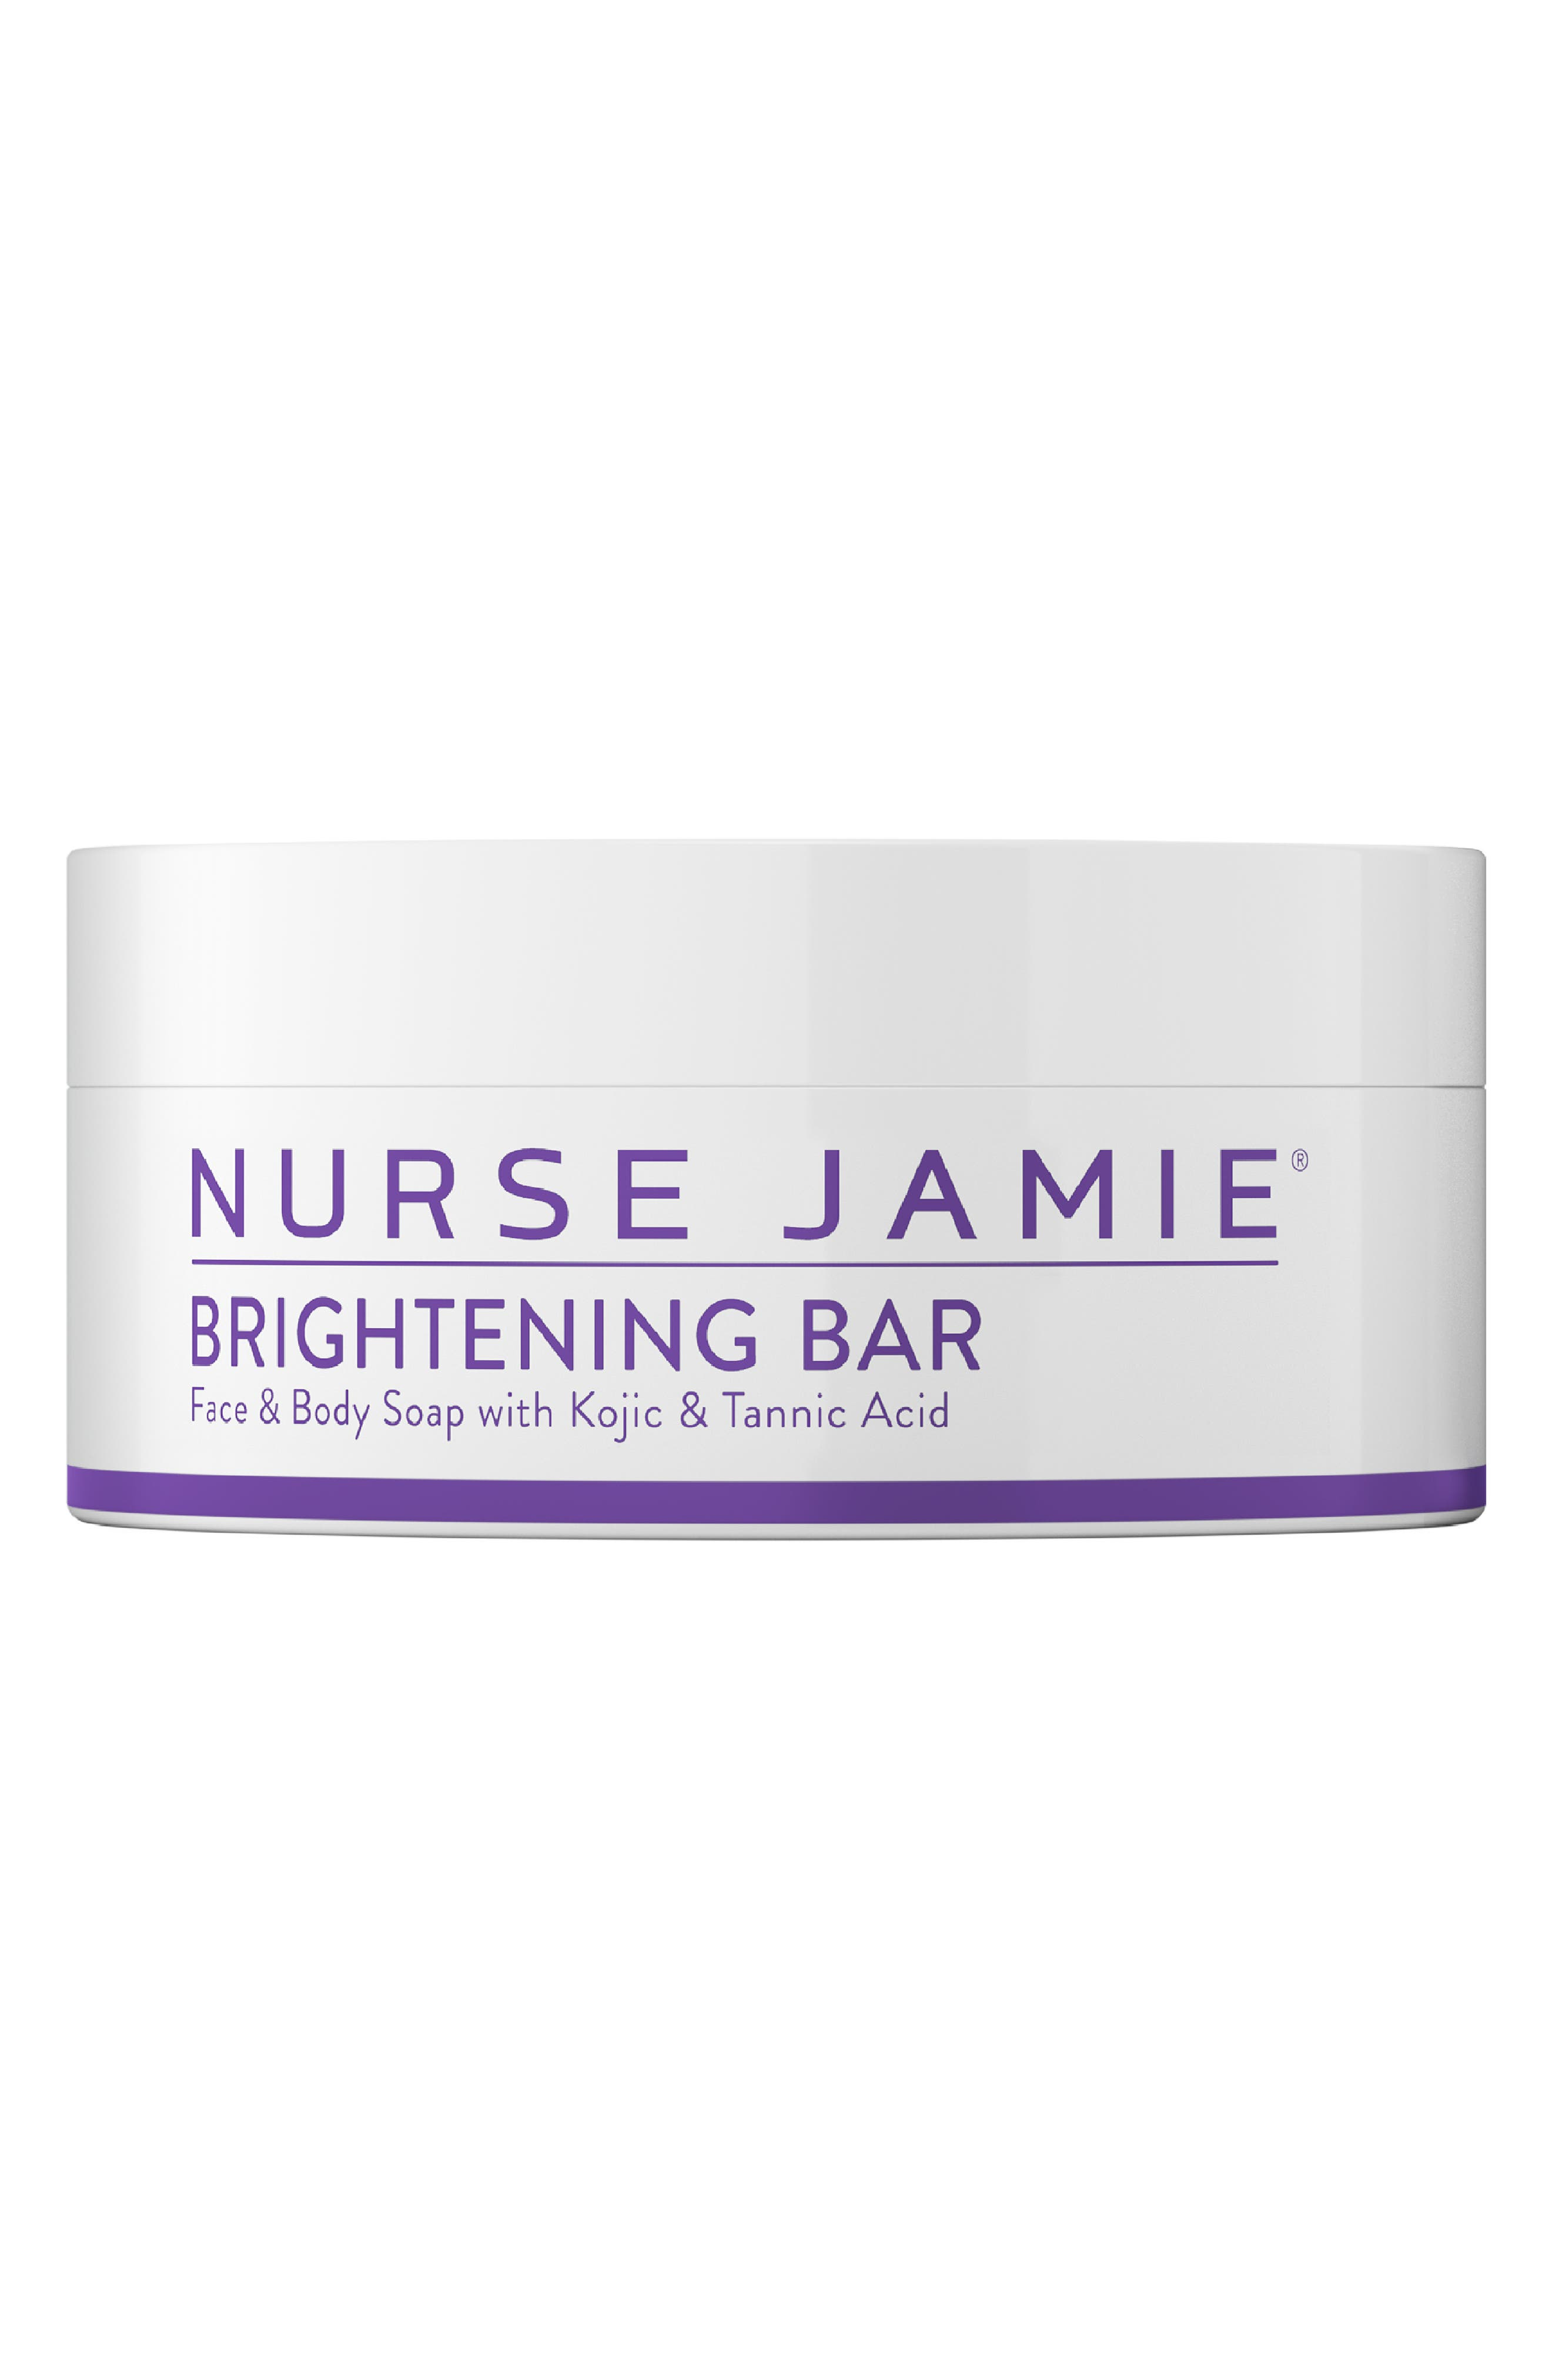 Fade to Light Pigment Erase Bar in a Jar,                             Main thumbnail 1, color,                             NO COLOR